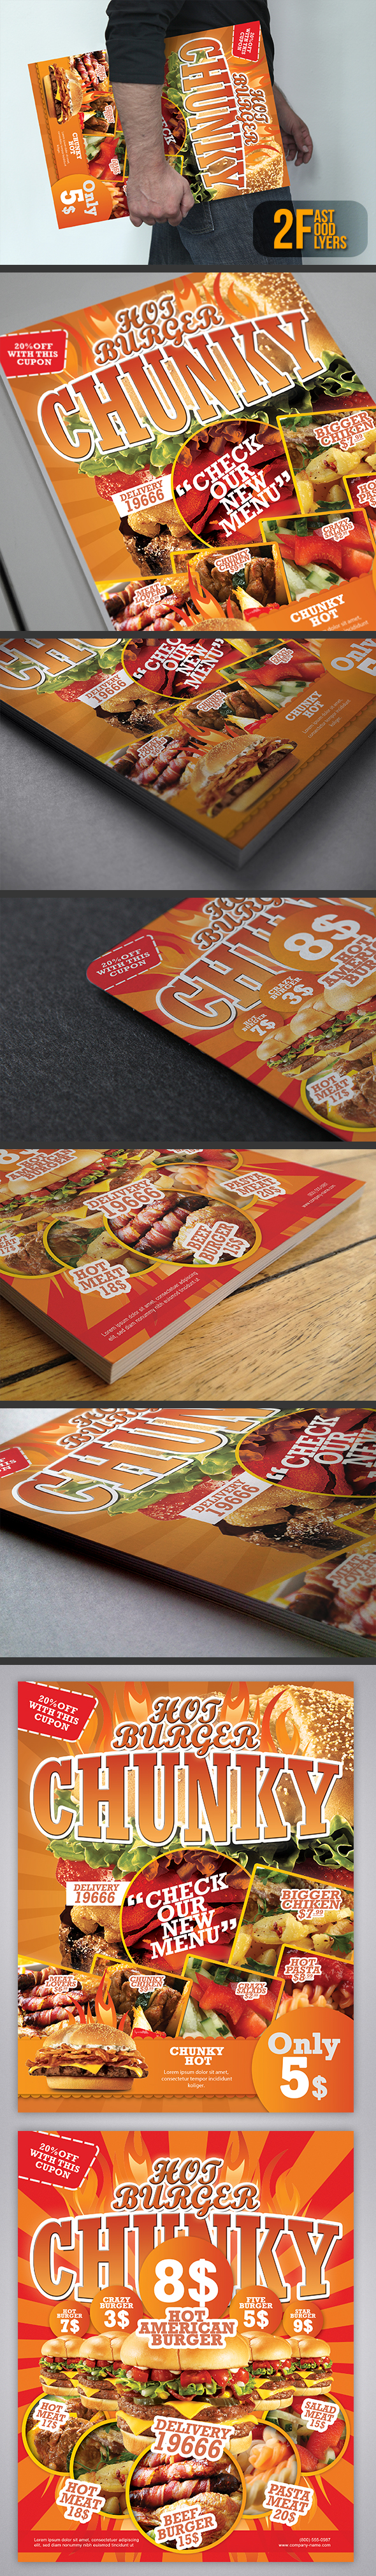 Fast Food Flyers / Magazine Ads by UnicoDesign